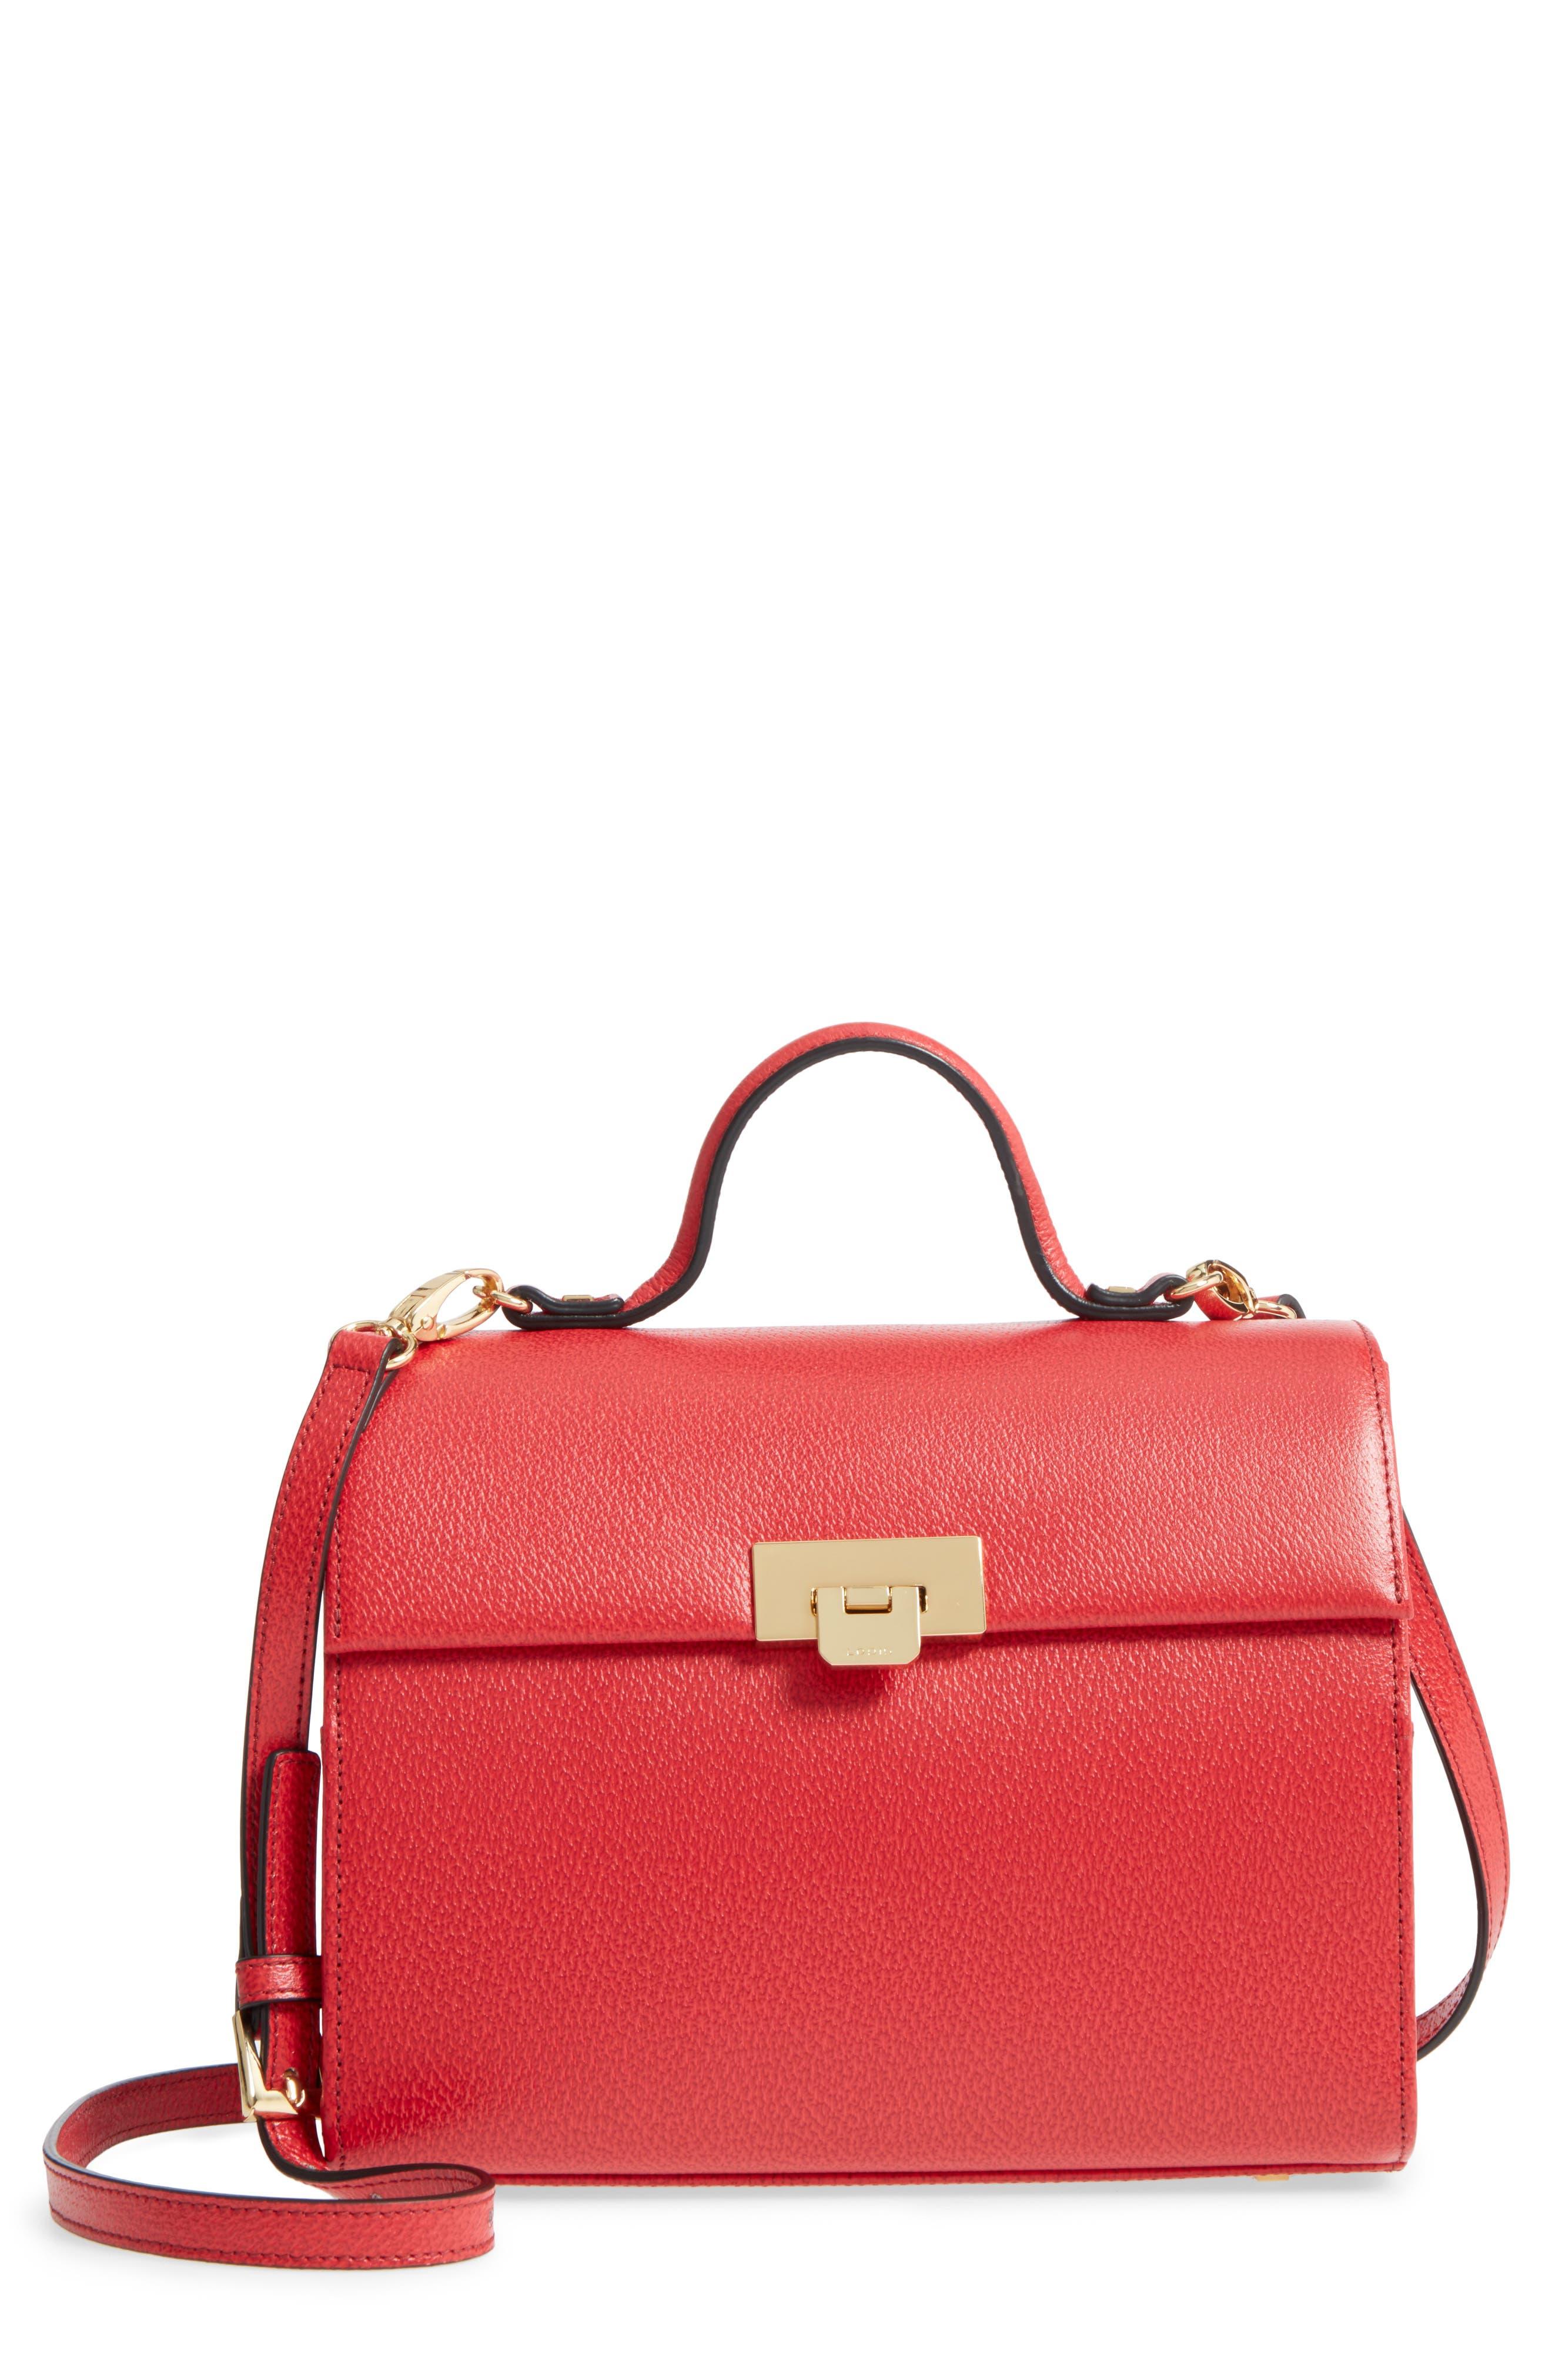 LODIS Stephanie Under Lock & Key - Medium Bree Leather Crossbody Bag,                         Main,                         color, Red